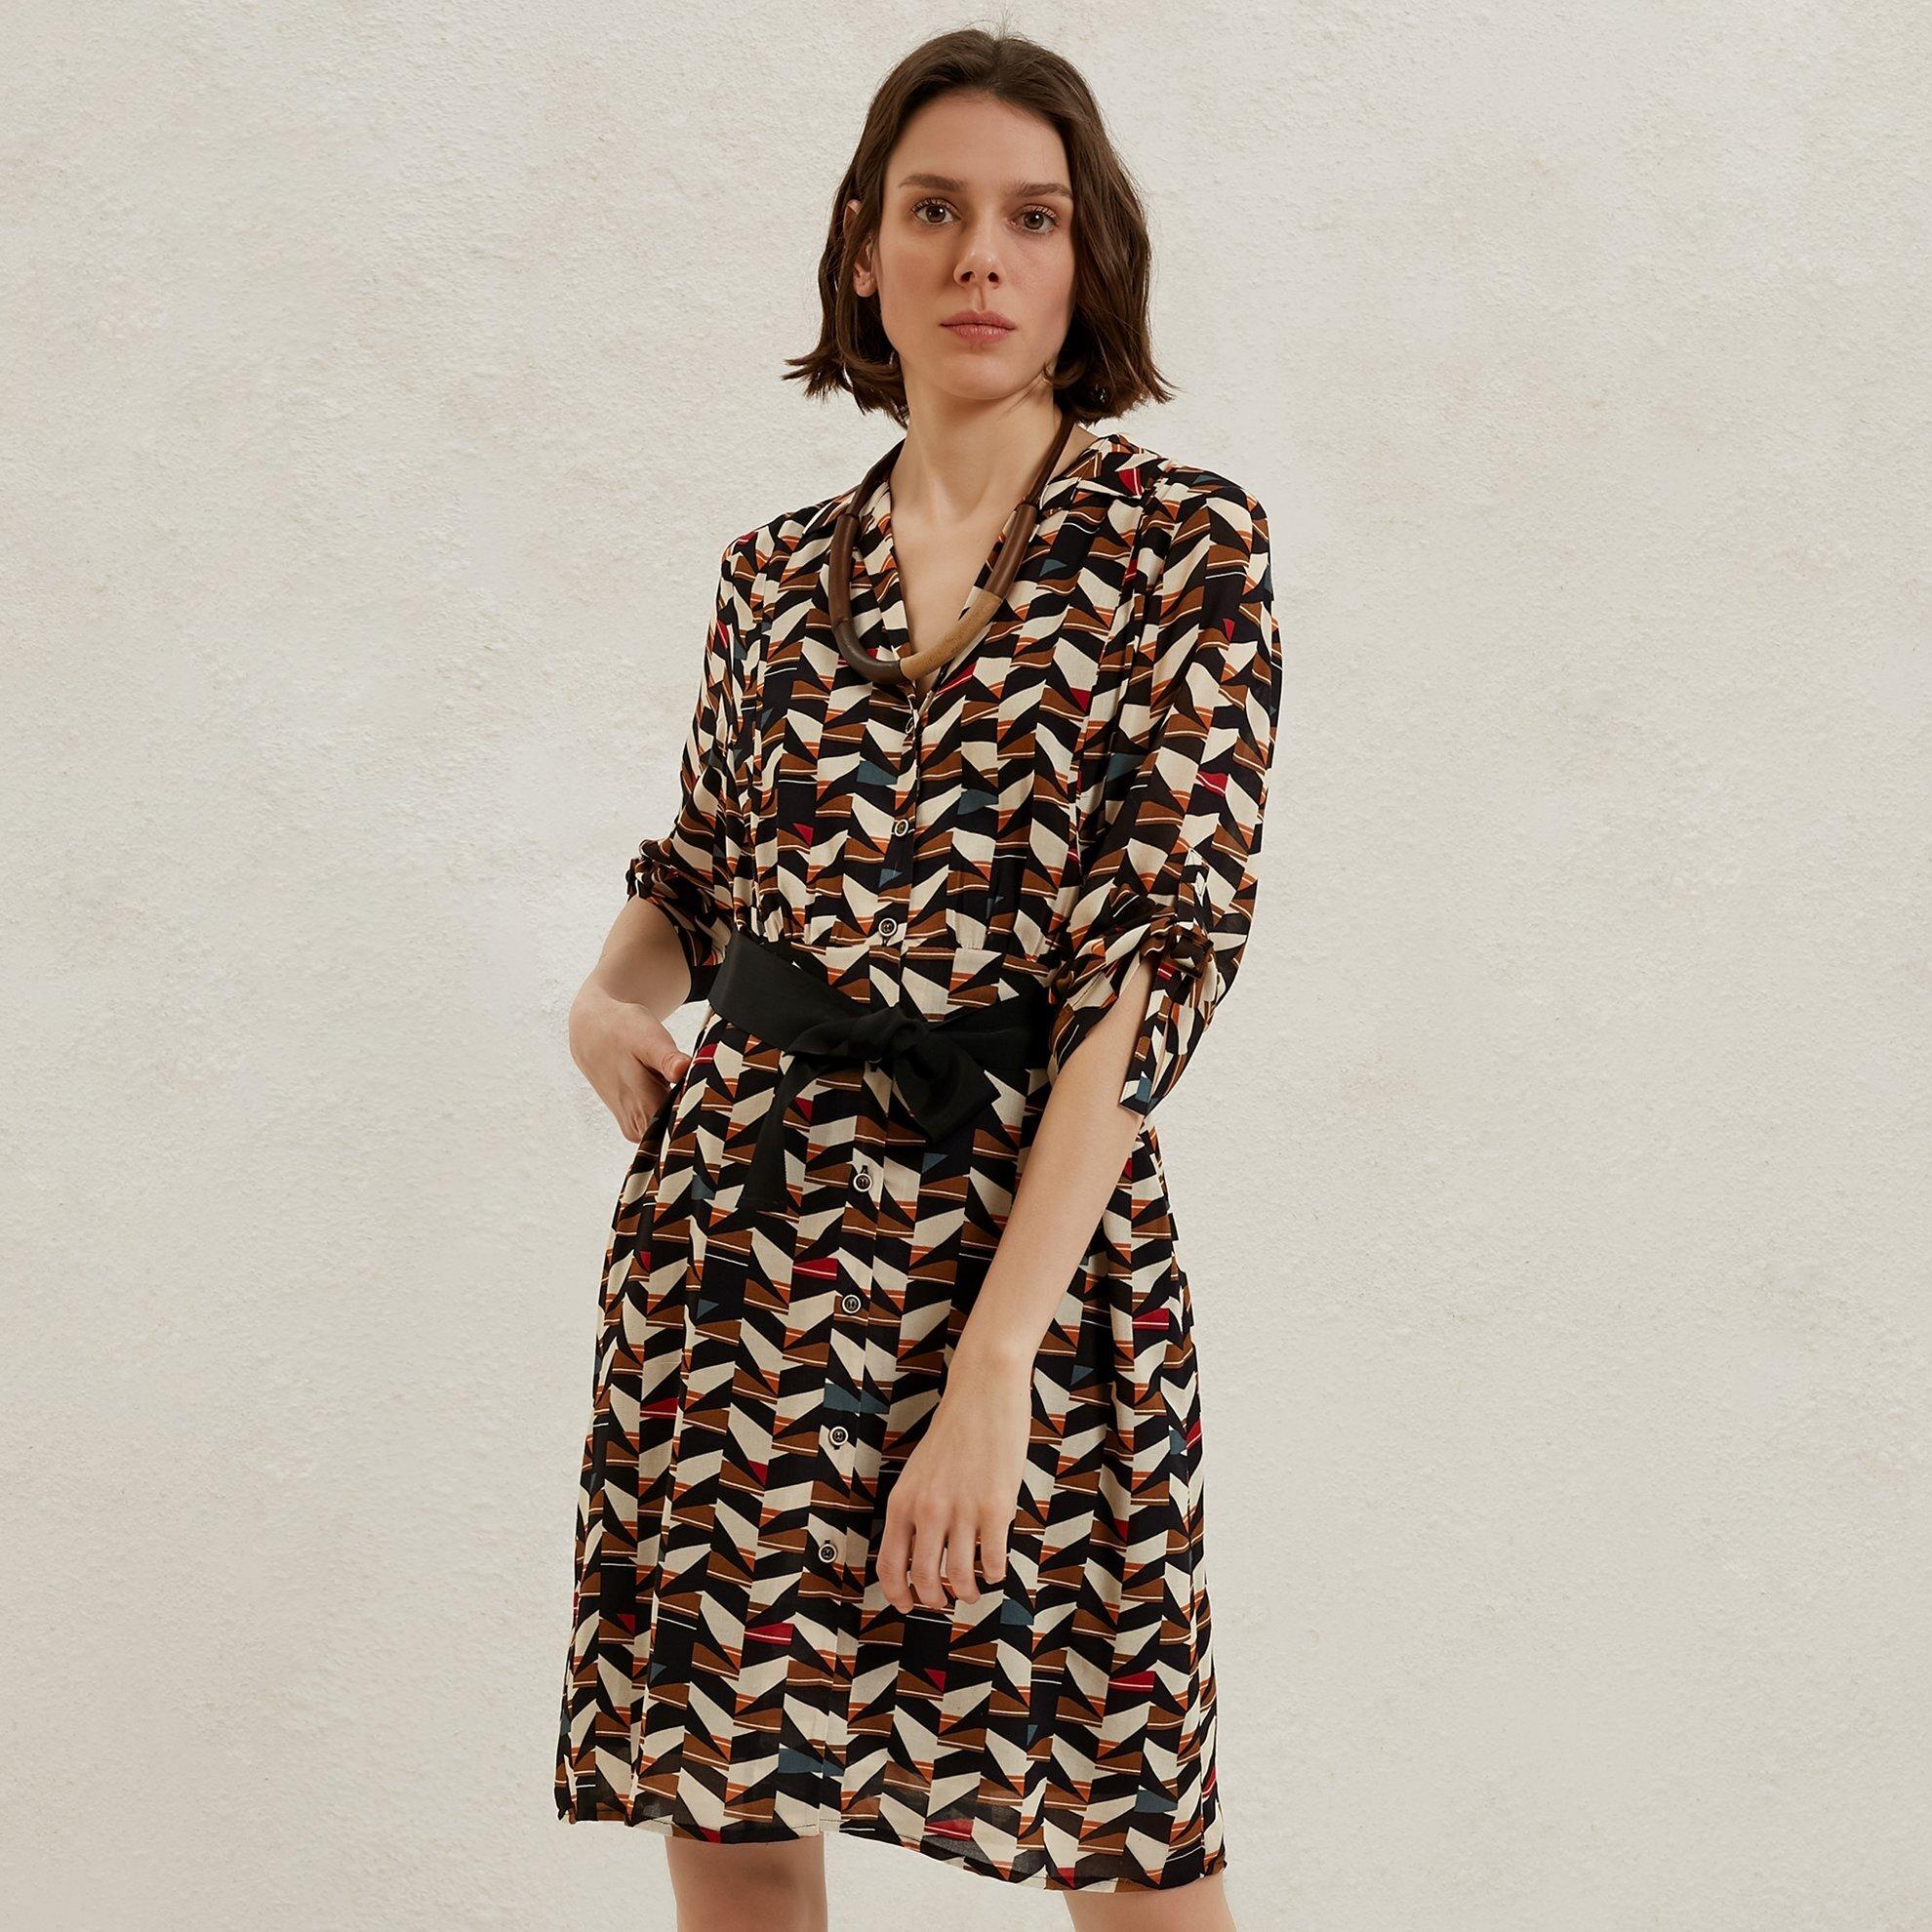 Contrast Belted Shirt Dress